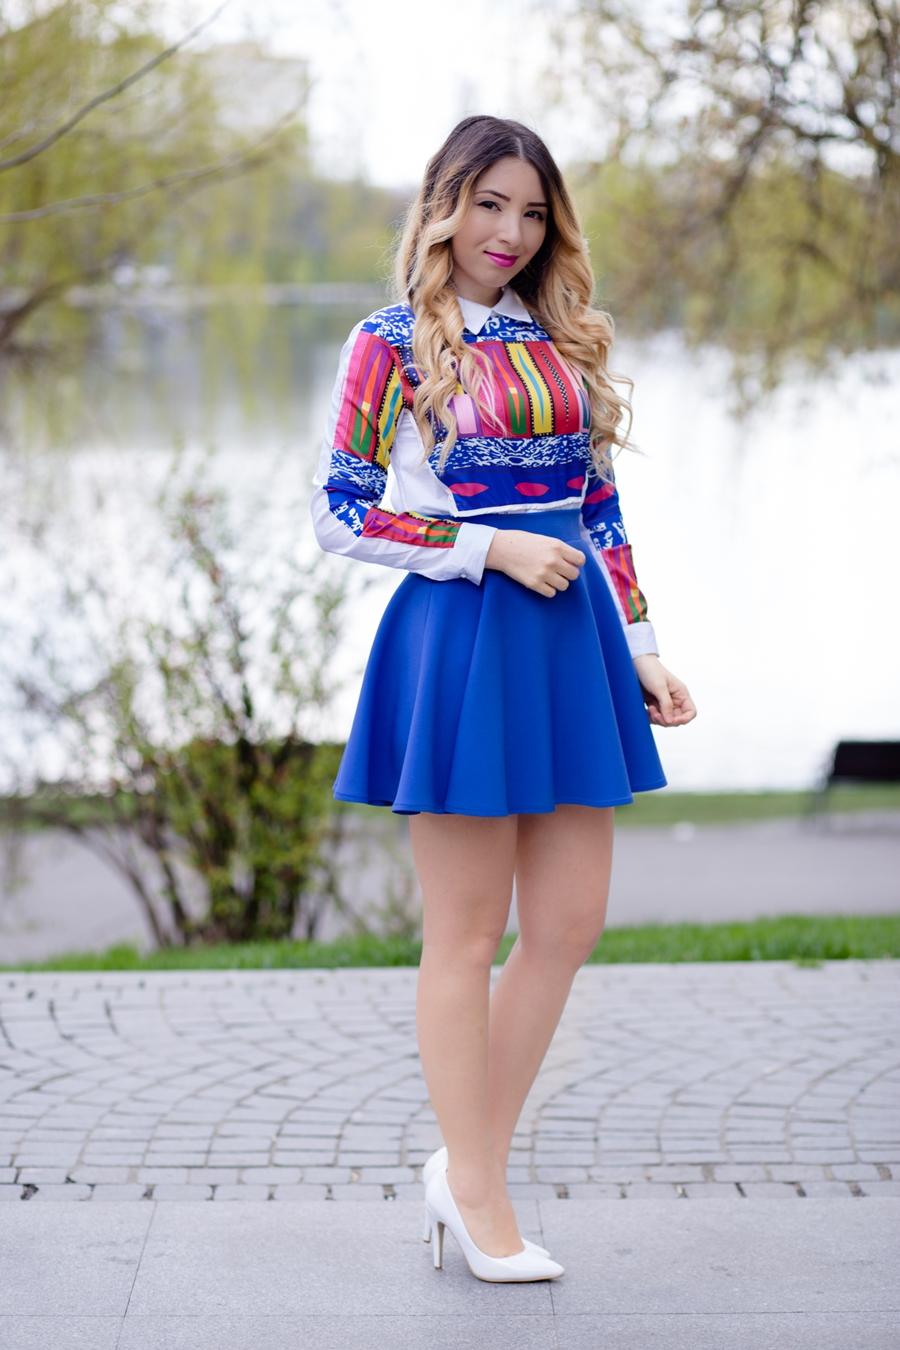 andreearistea.ro - cum purtam tinutele colorate primavara - idei, tendinte in moda 2016 camasa colorata si fusta in clos albastra